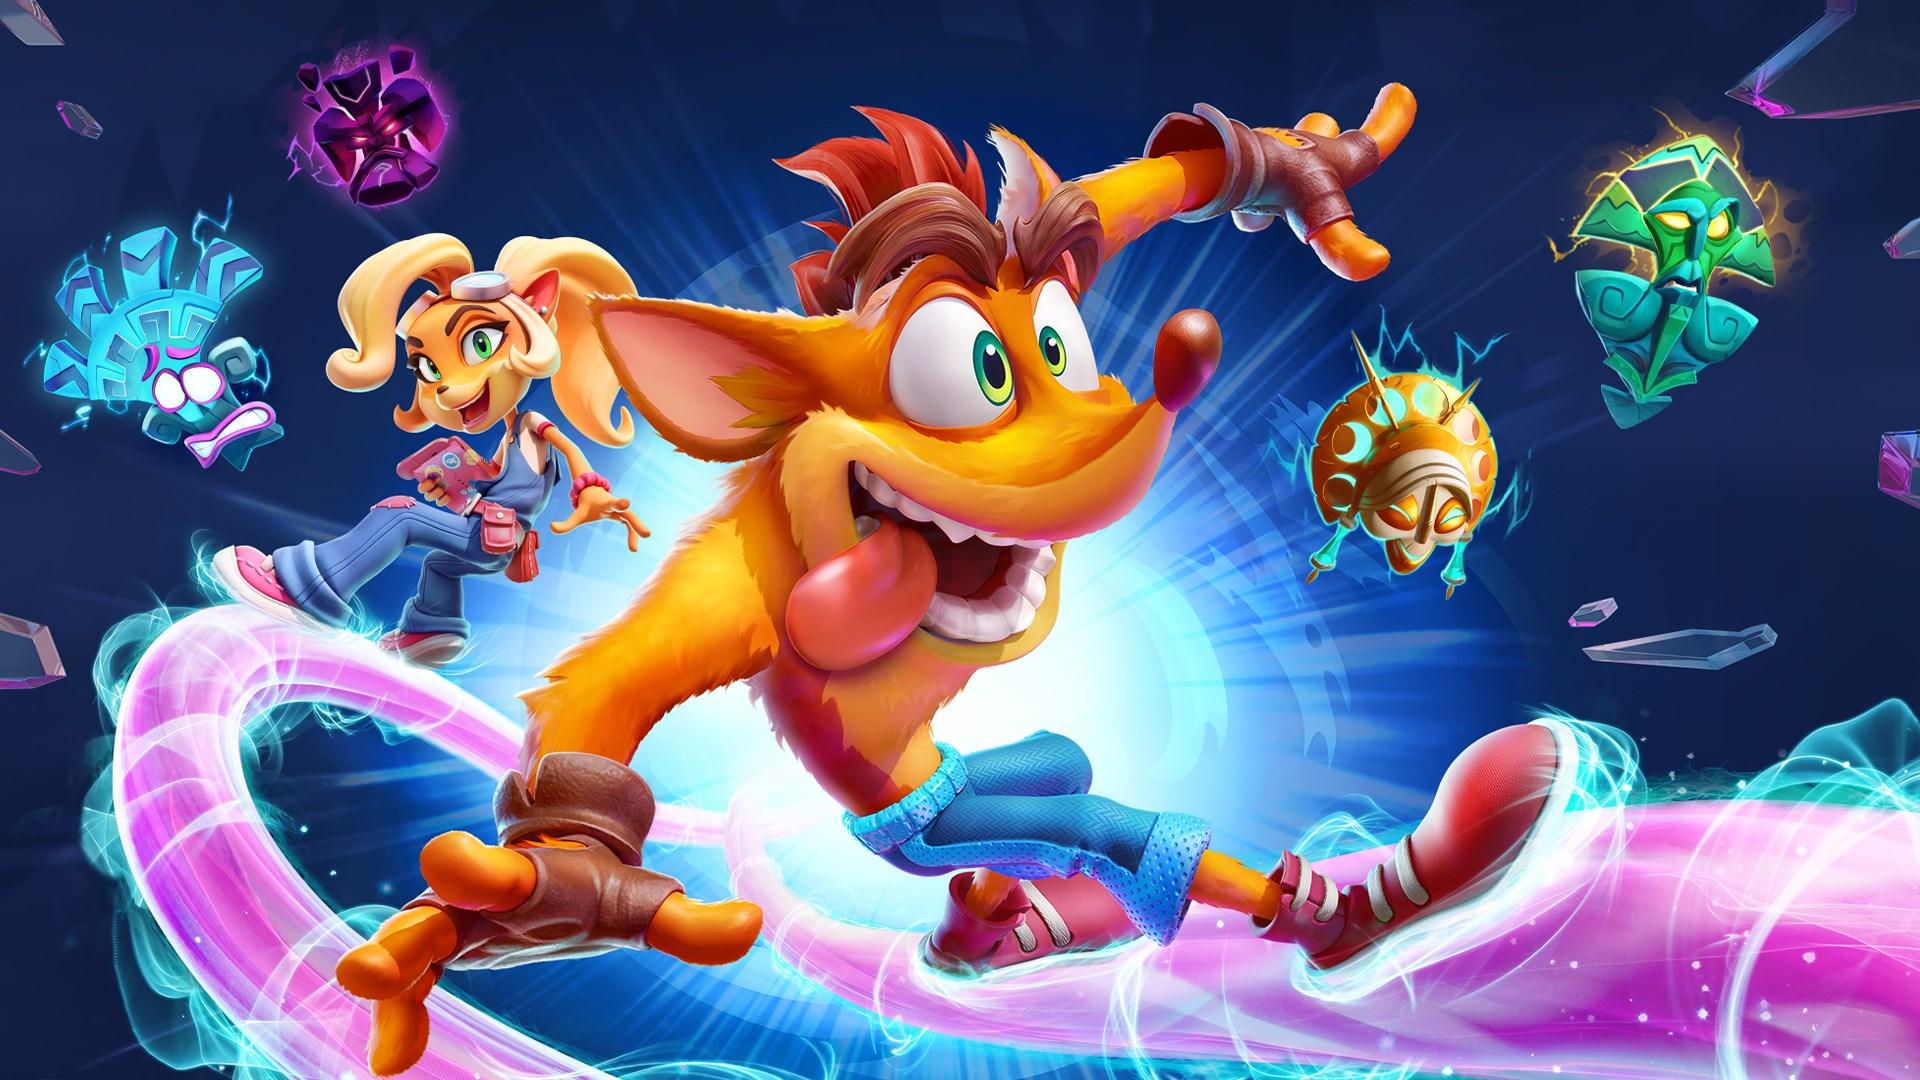 Crash Bandicoot 4: It's About Time — Наперегонки со временем